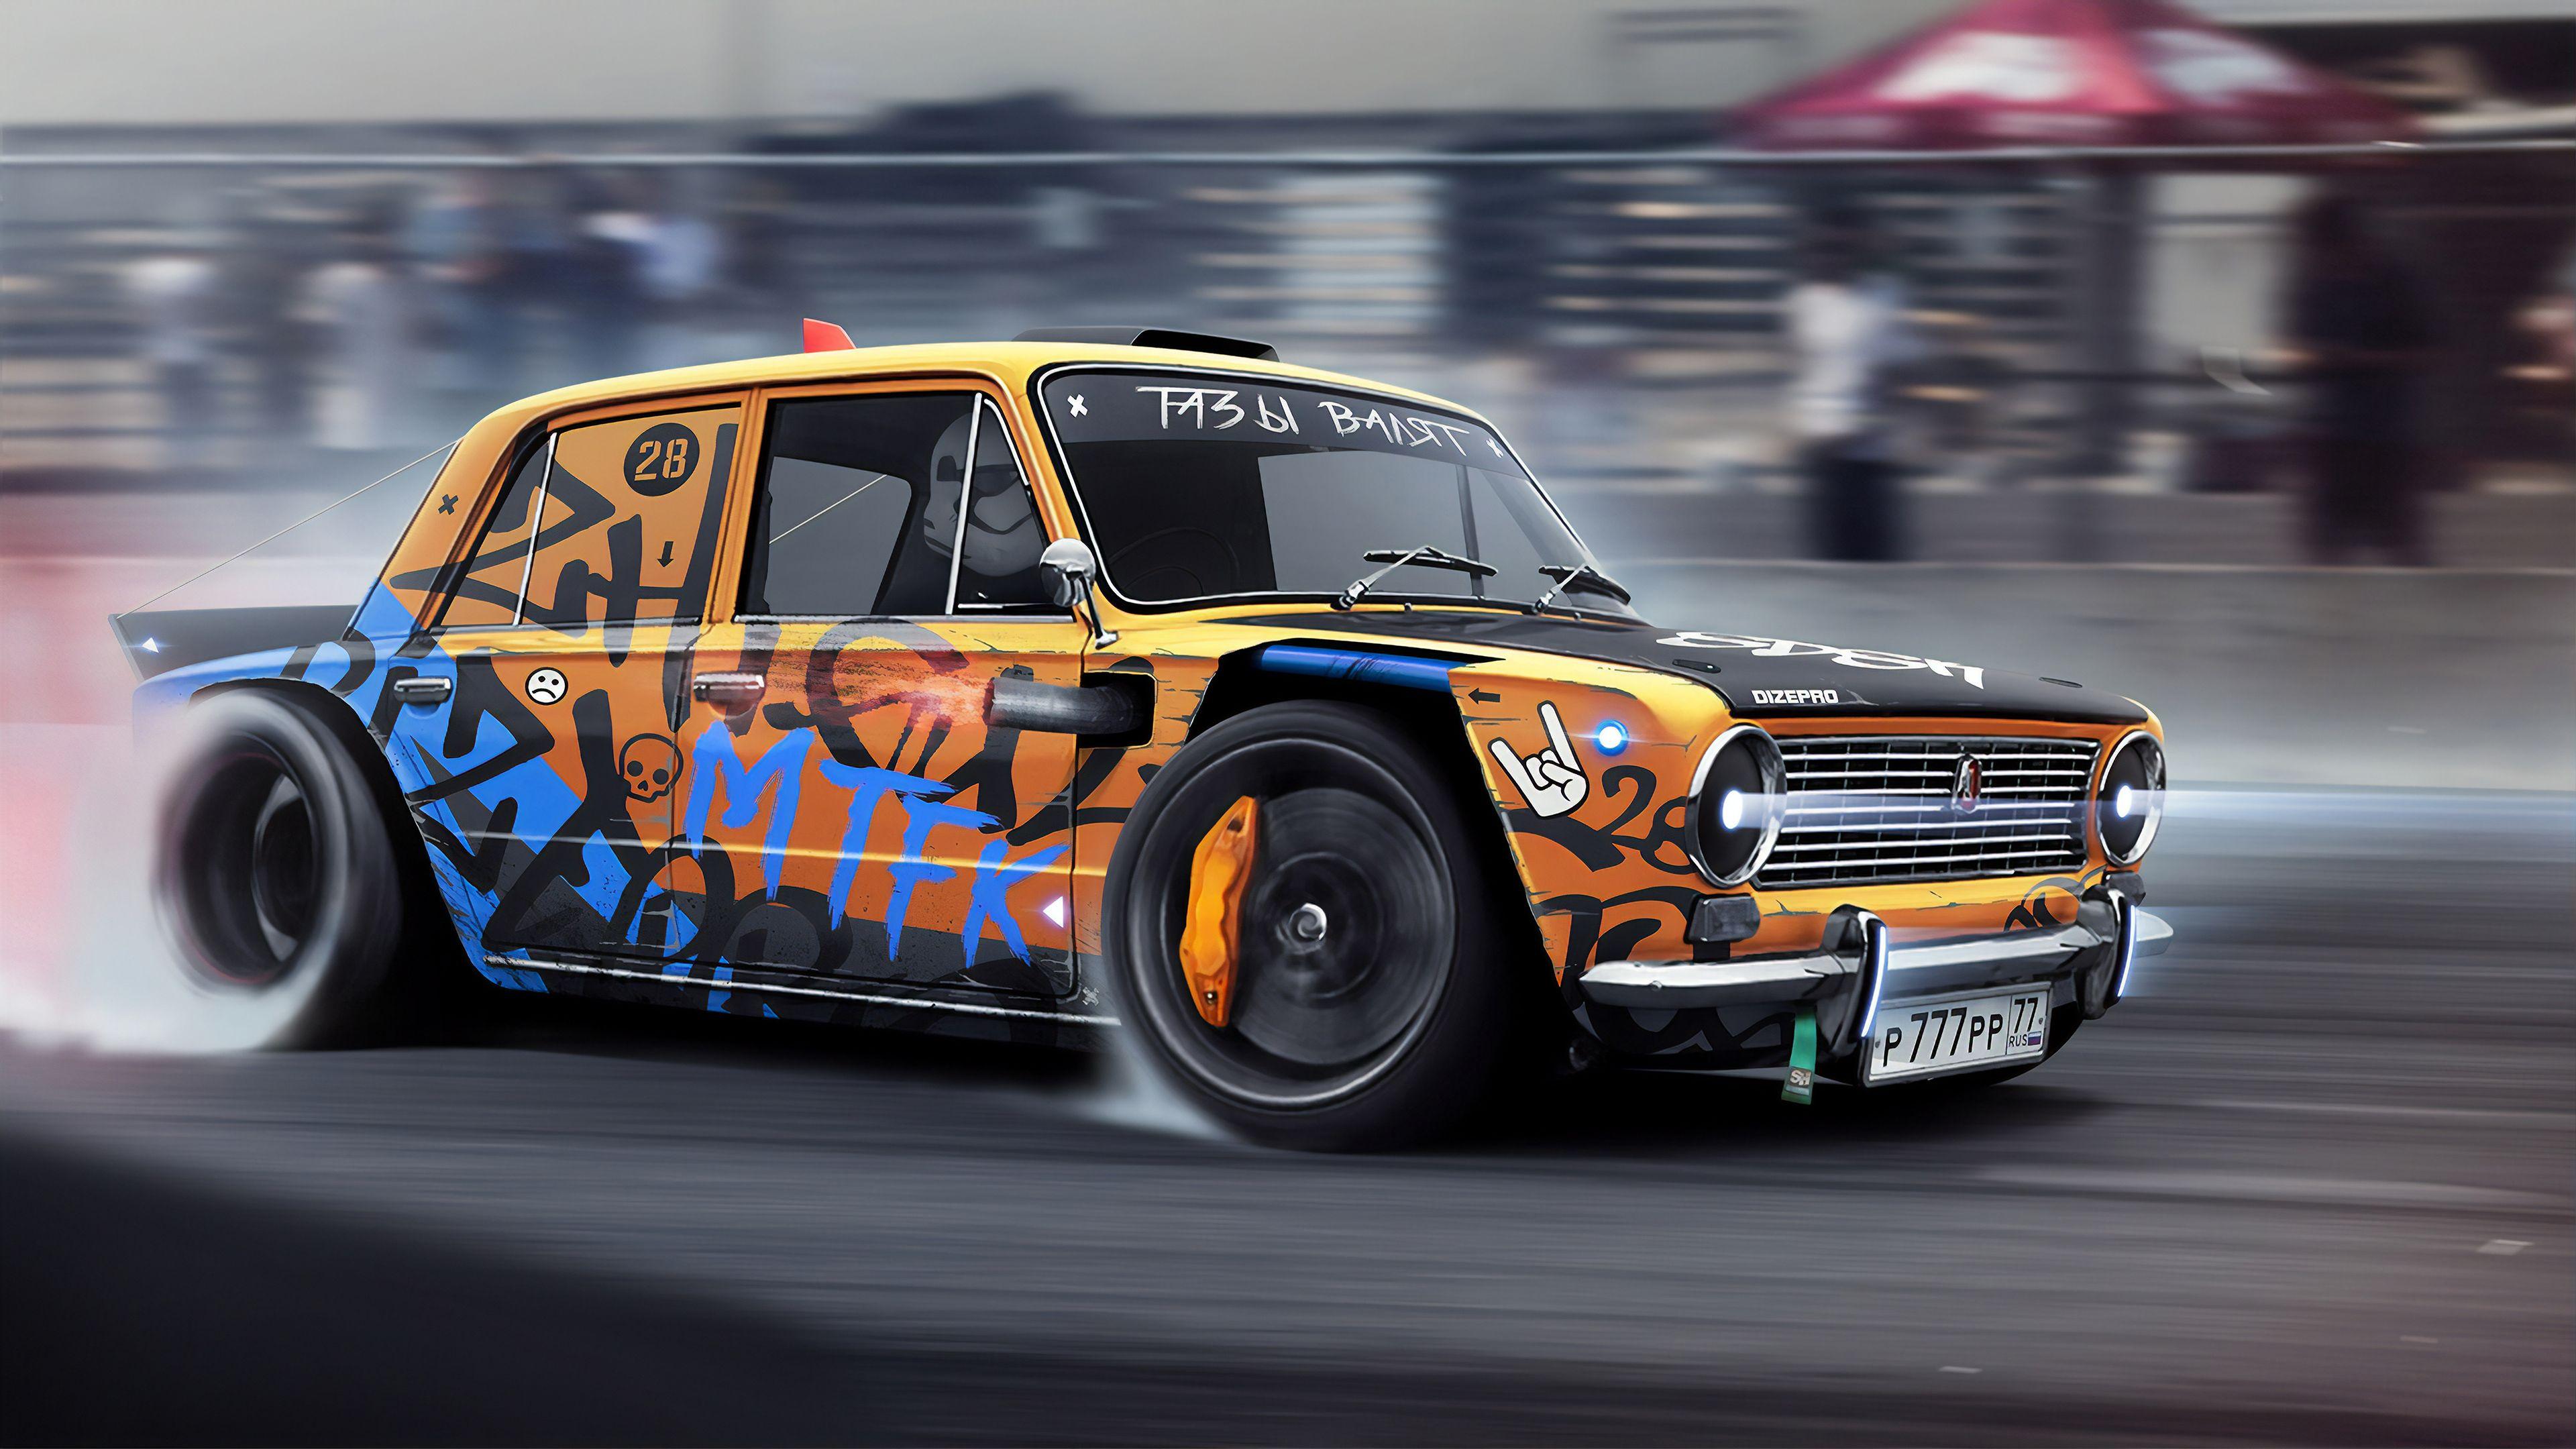 Drift Monster Hd Wallpapers Drifting Cars Wallpapers Digital Art Wallpapers Cars Wallpapers Artwork Wallpapers Artstation Car Wallpapers Drifting Cars Car